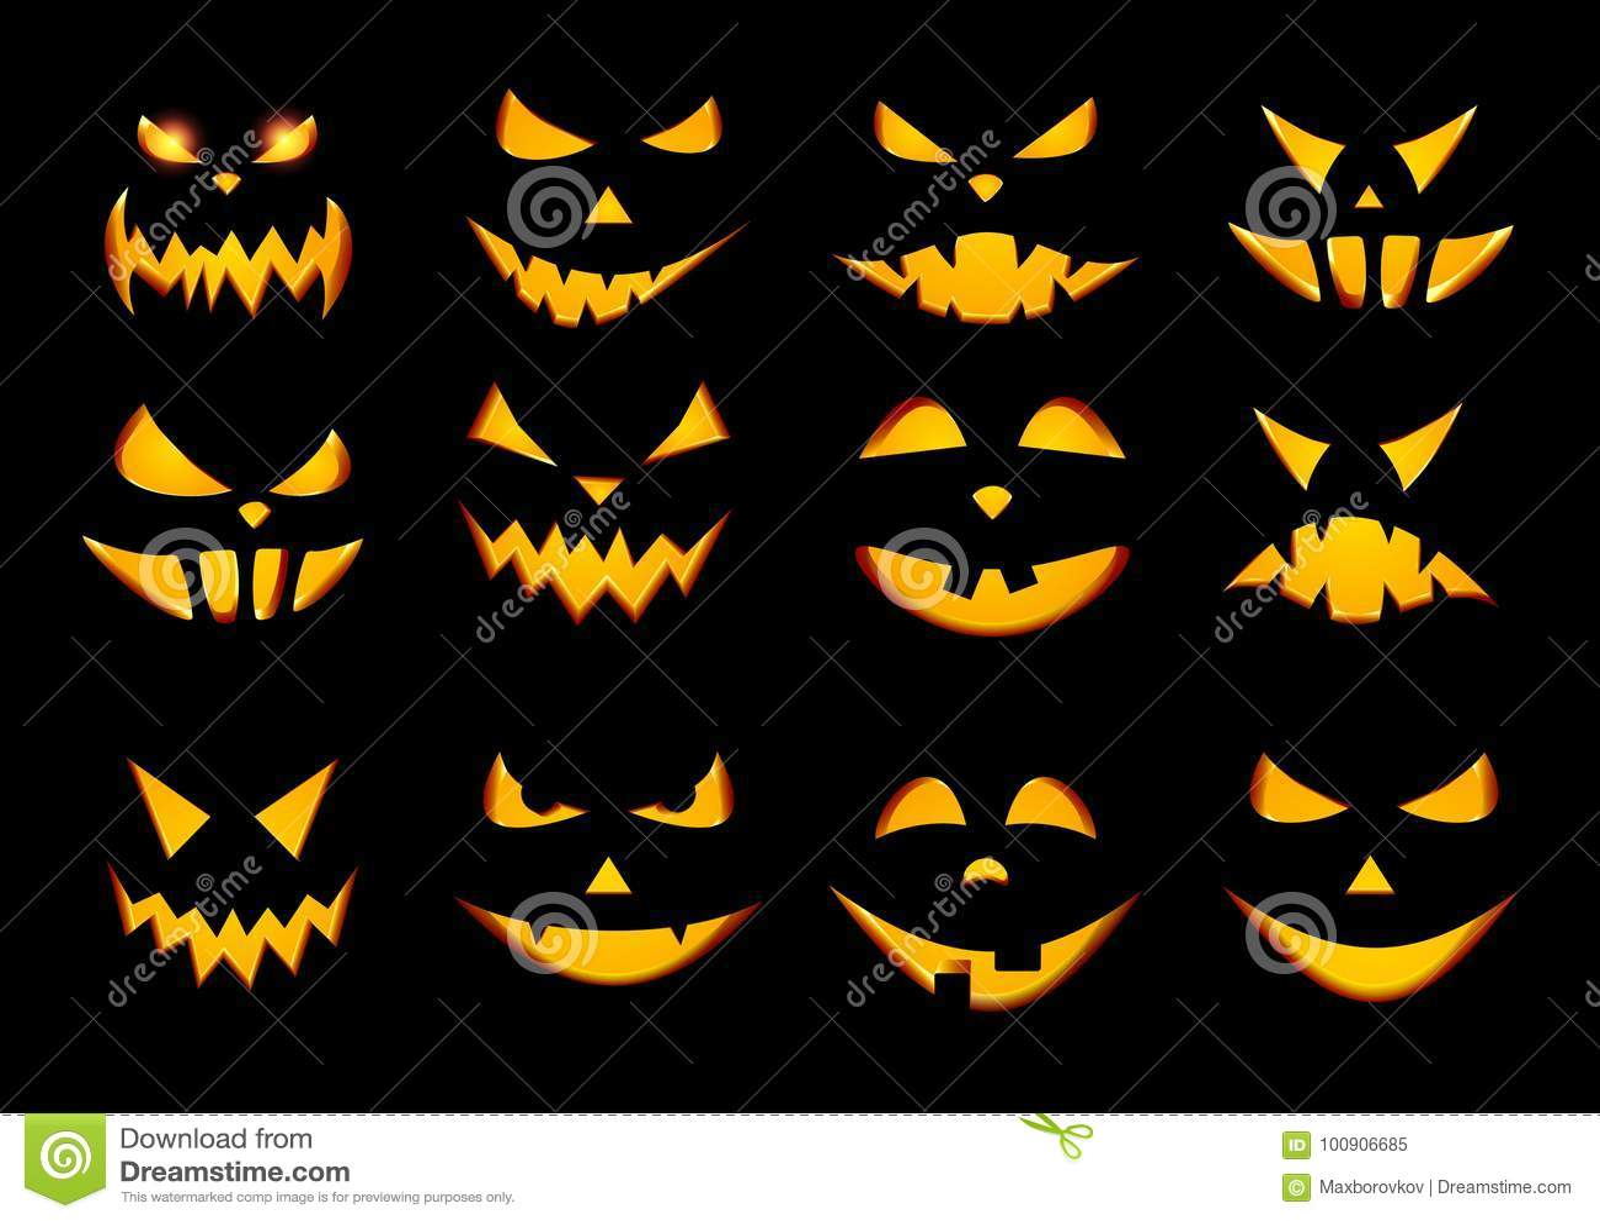 Halloween Pumpkin Face Patterns On Black Stock Vector